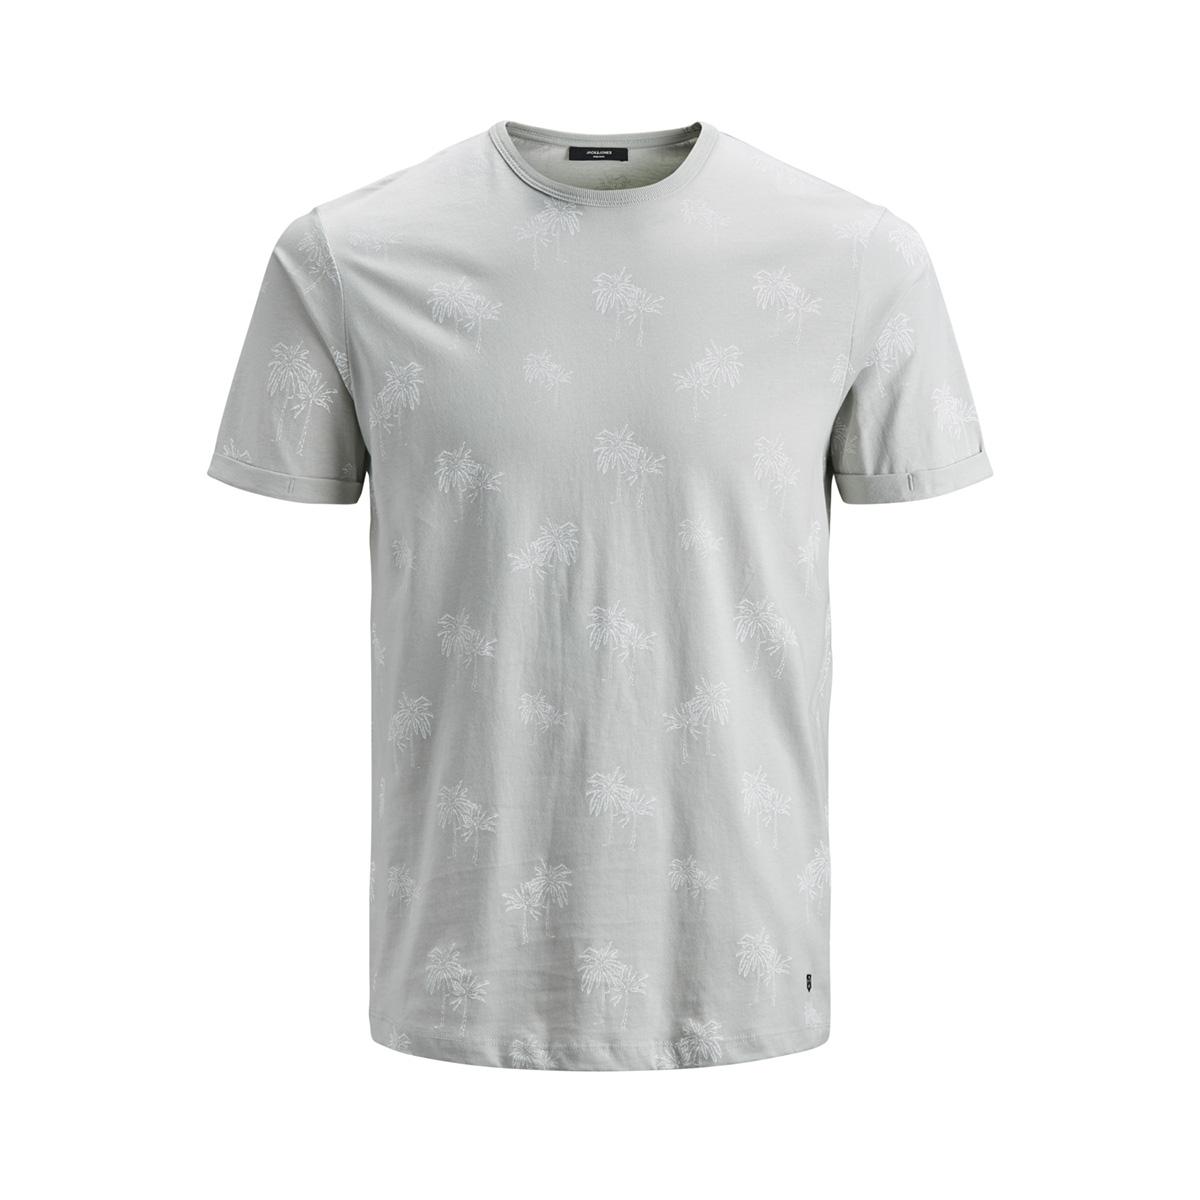 jprslam bla. tee ss crewneck 12153820 jack & jones t-shirt metal/slim fit